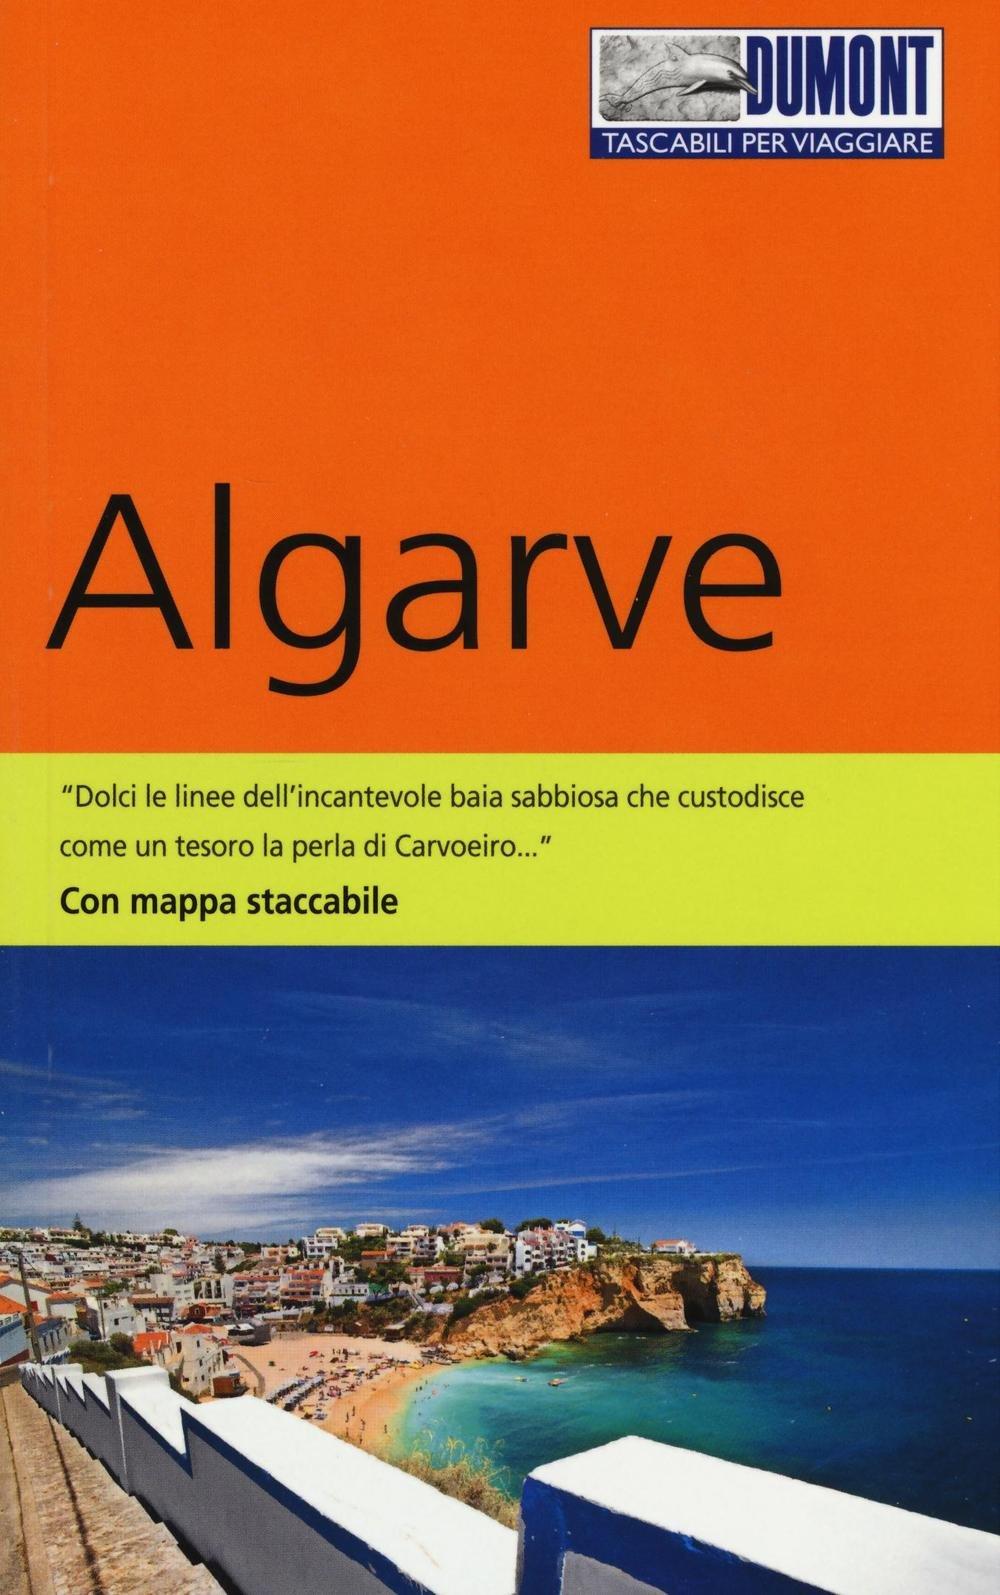 Cartina Geografica Algarve.Amazon It Algarve Con Carta Geografica Ripiegata Missler Eva Colombo Roberta Libri